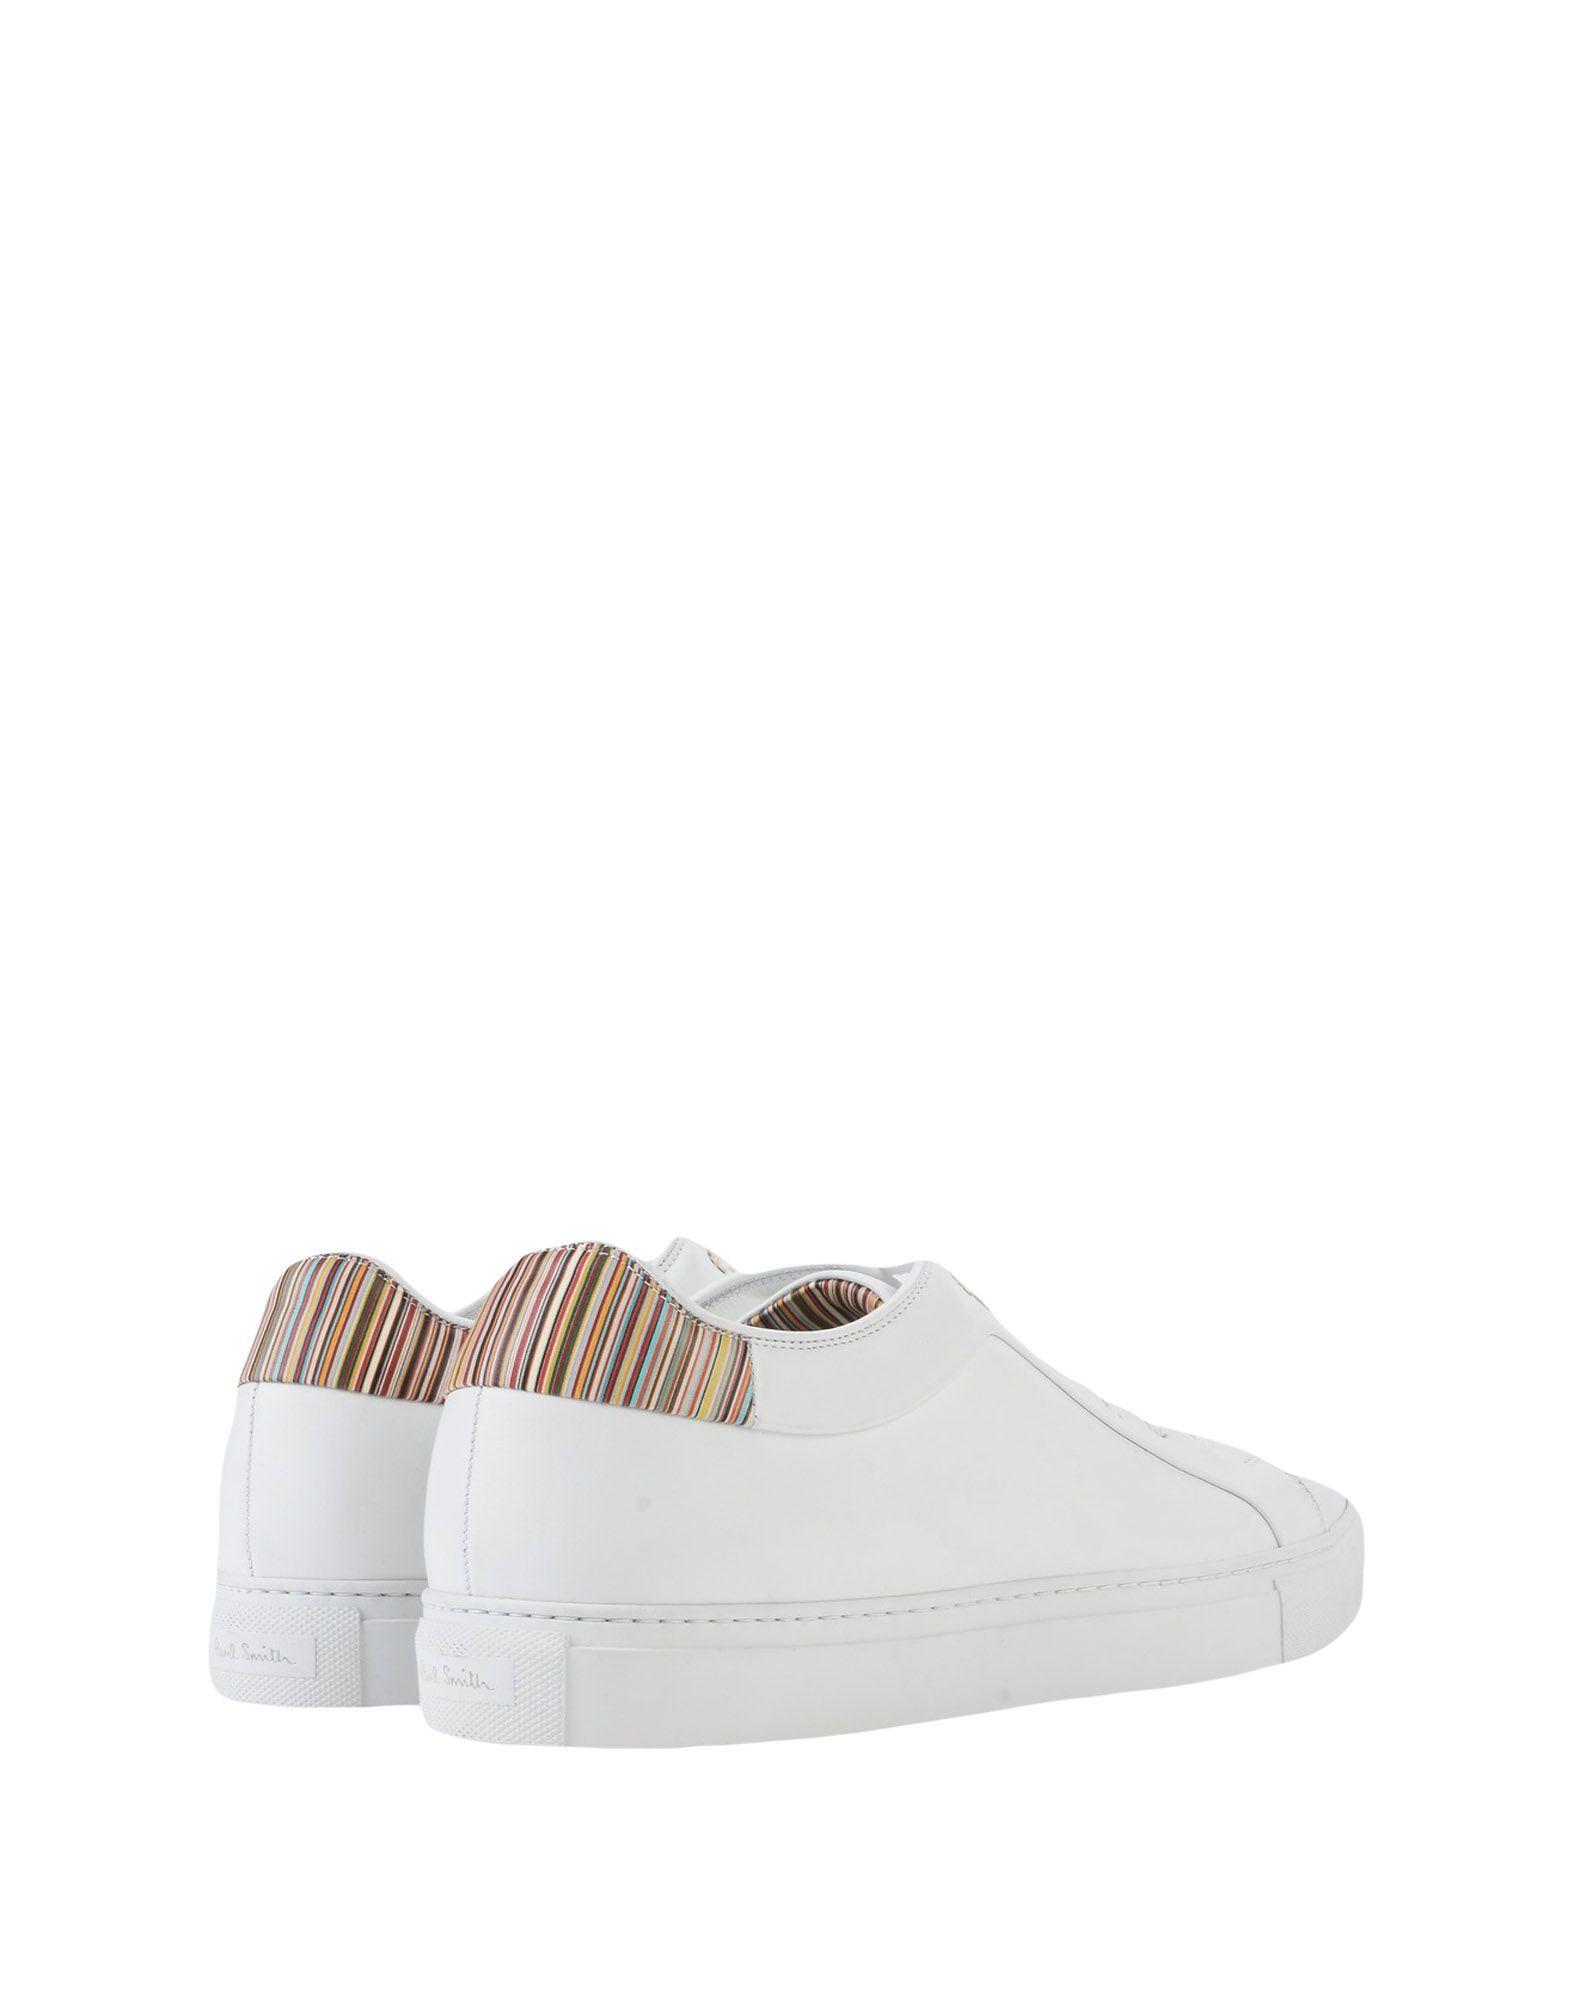 Paul Smith Sneakers Qualität Herren  11503617IR Gute Qualität Sneakers beliebte Schuhe cd8f92